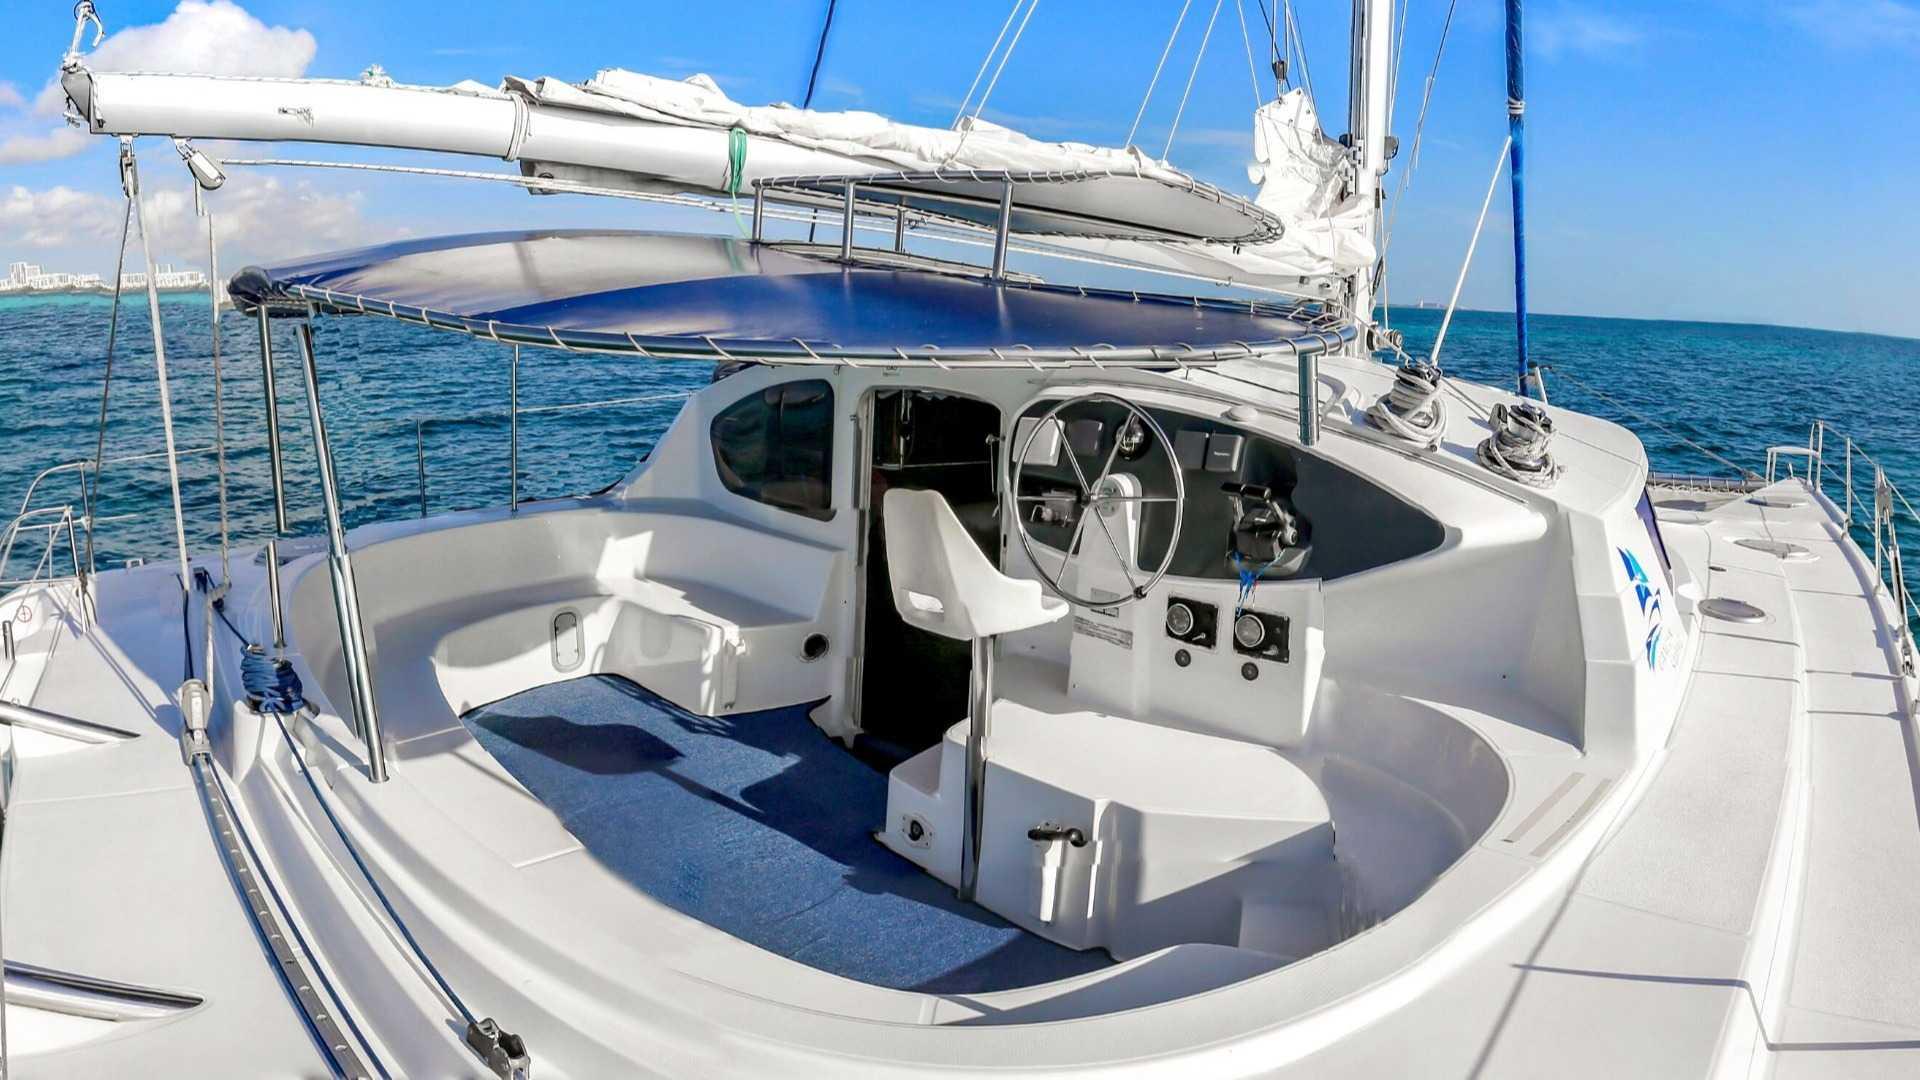 6 - LoRes - Lady Caroline - Isla Mujeres Catamaran Tour - Cancun Sailing